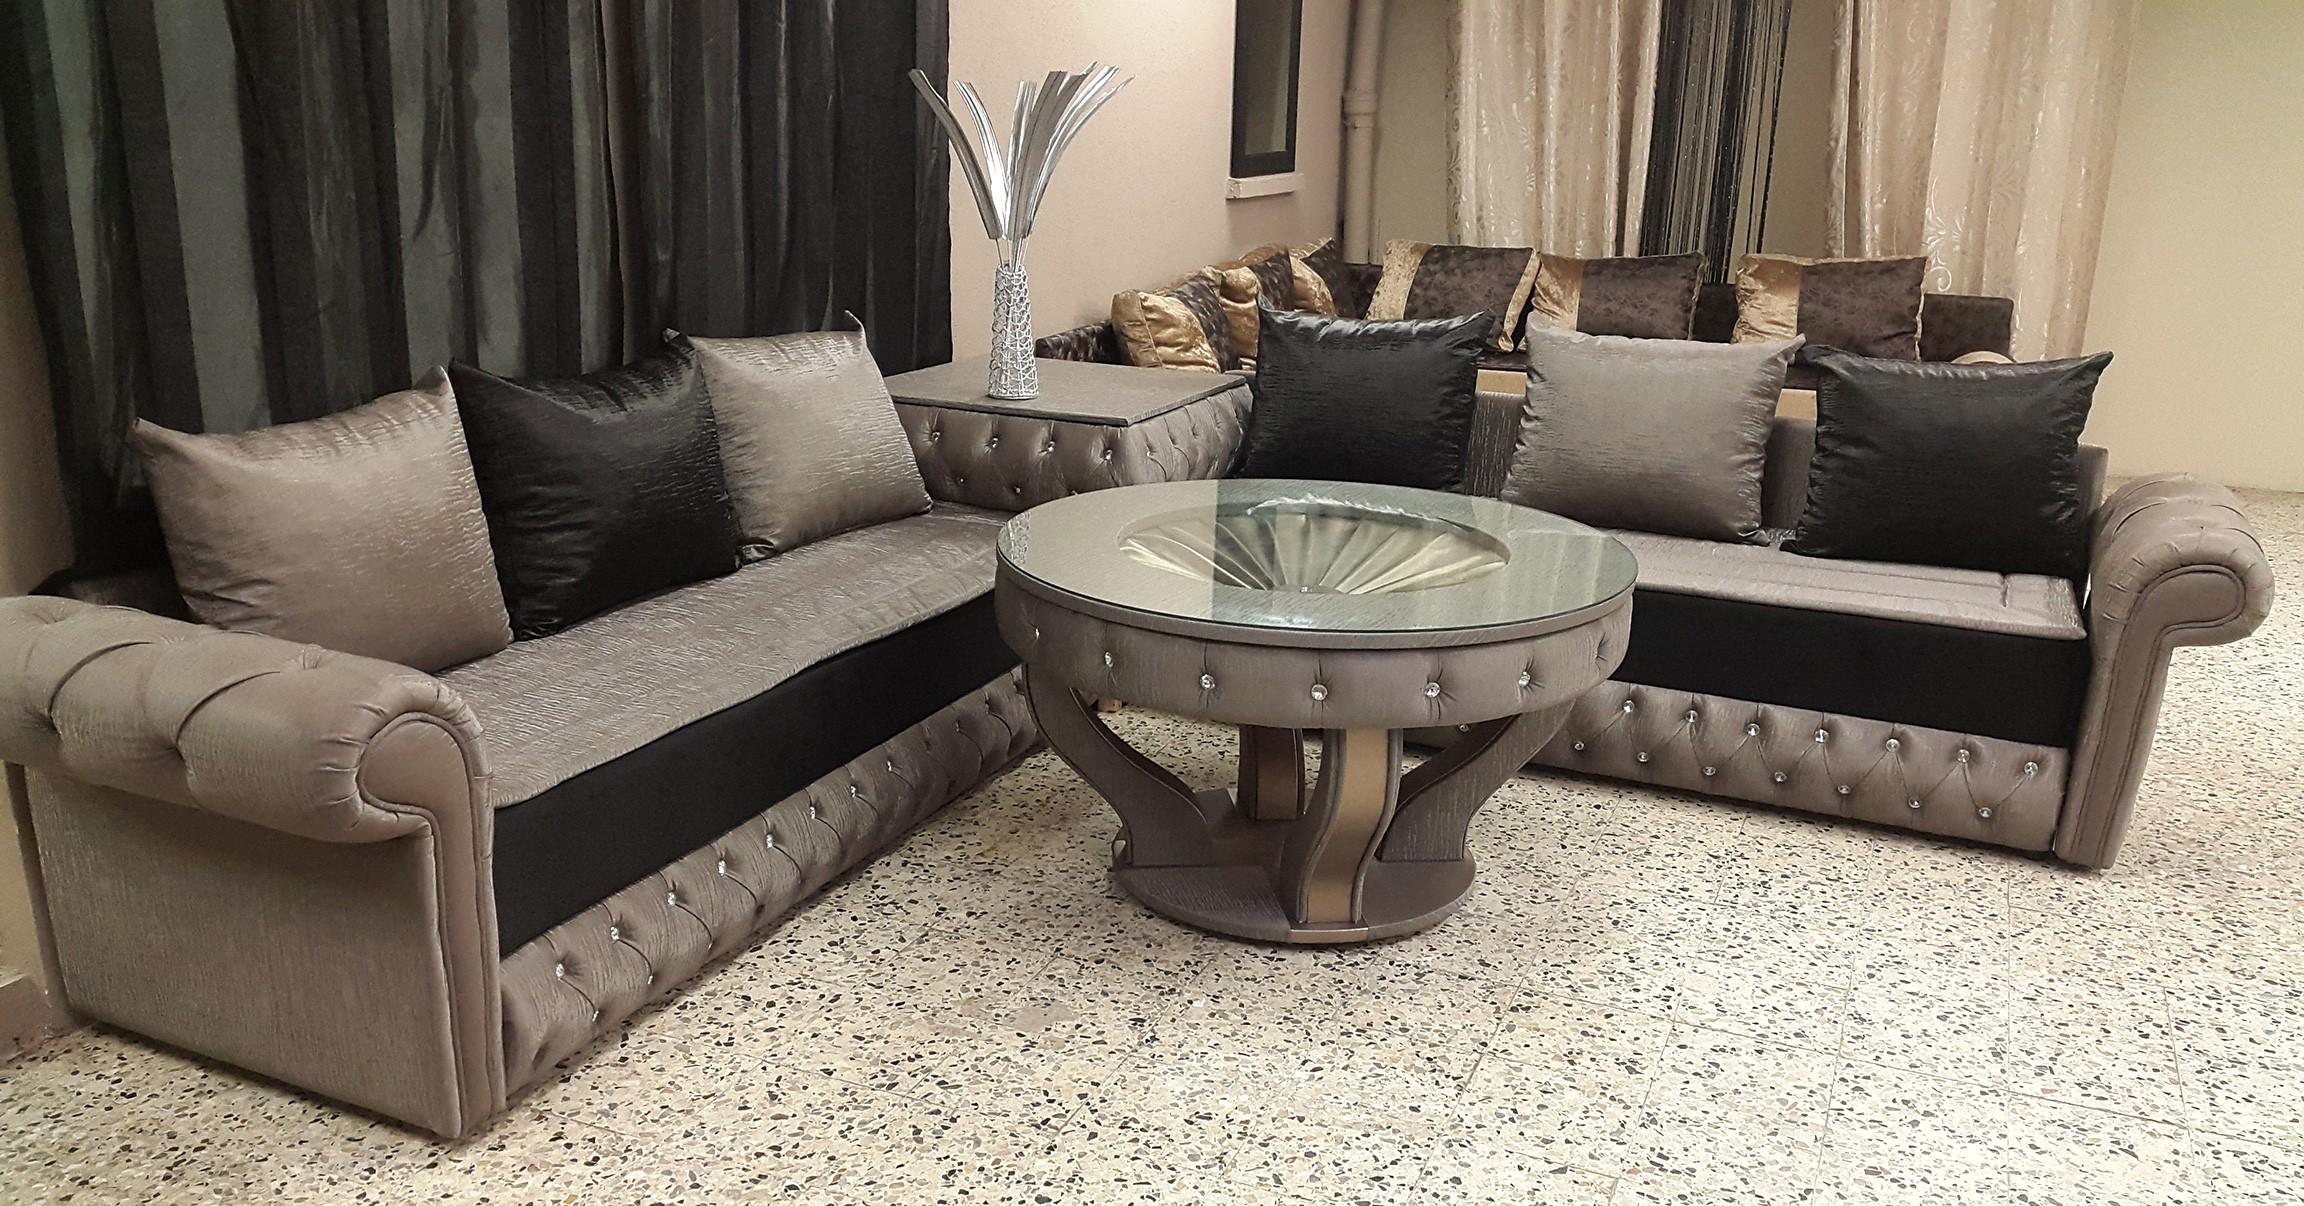 canape marocain design cuir canap id es de d coration de maison wydj45znrq. Black Bedroom Furniture Sets. Home Design Ideas